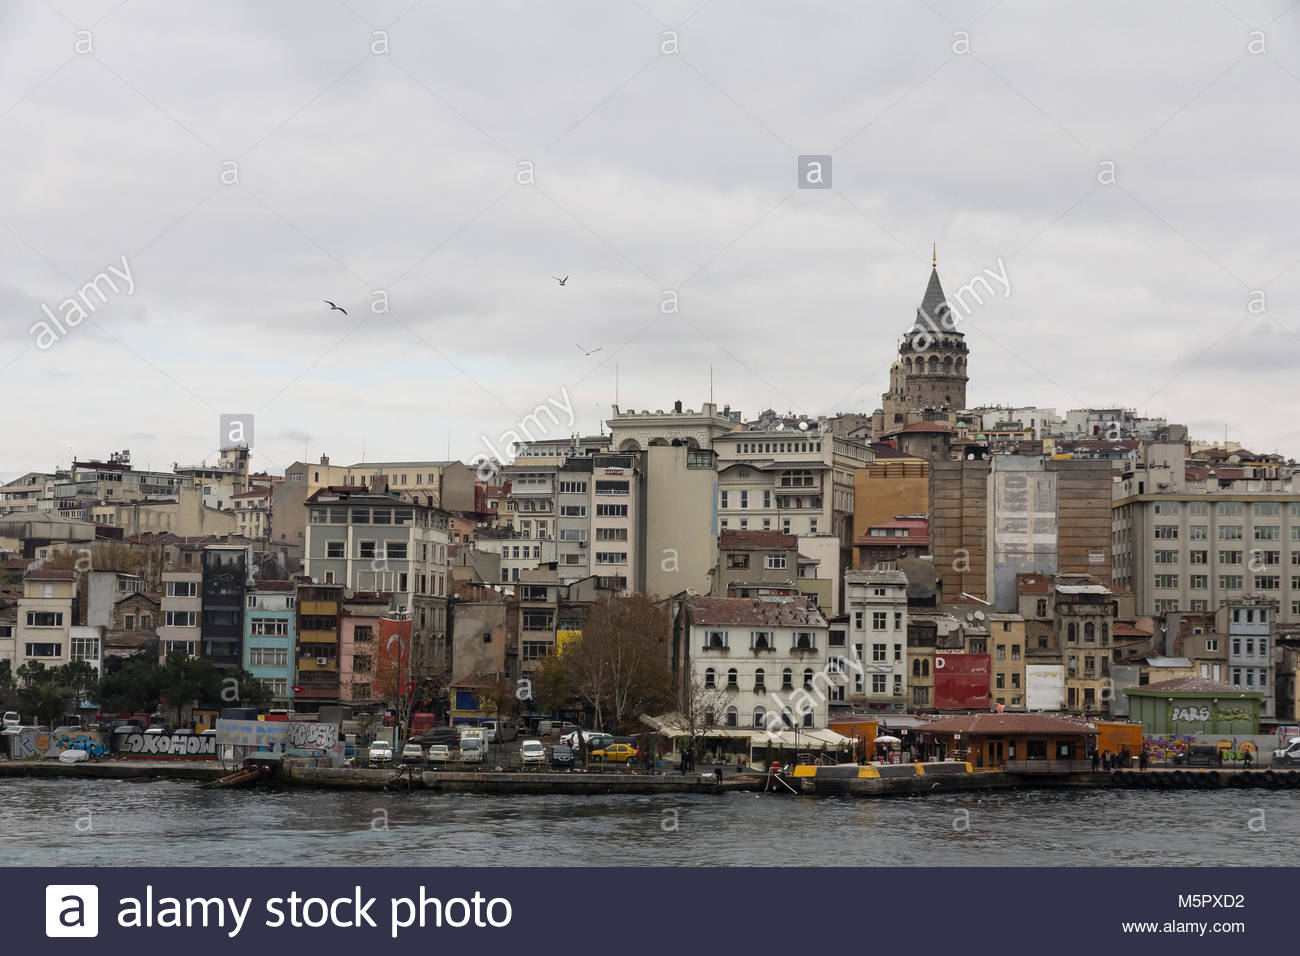 Istanbul, Turkey-December 12, 2015 -View of the Galata tower and moorage on the strait of the strait of the Turkish - Stock Image